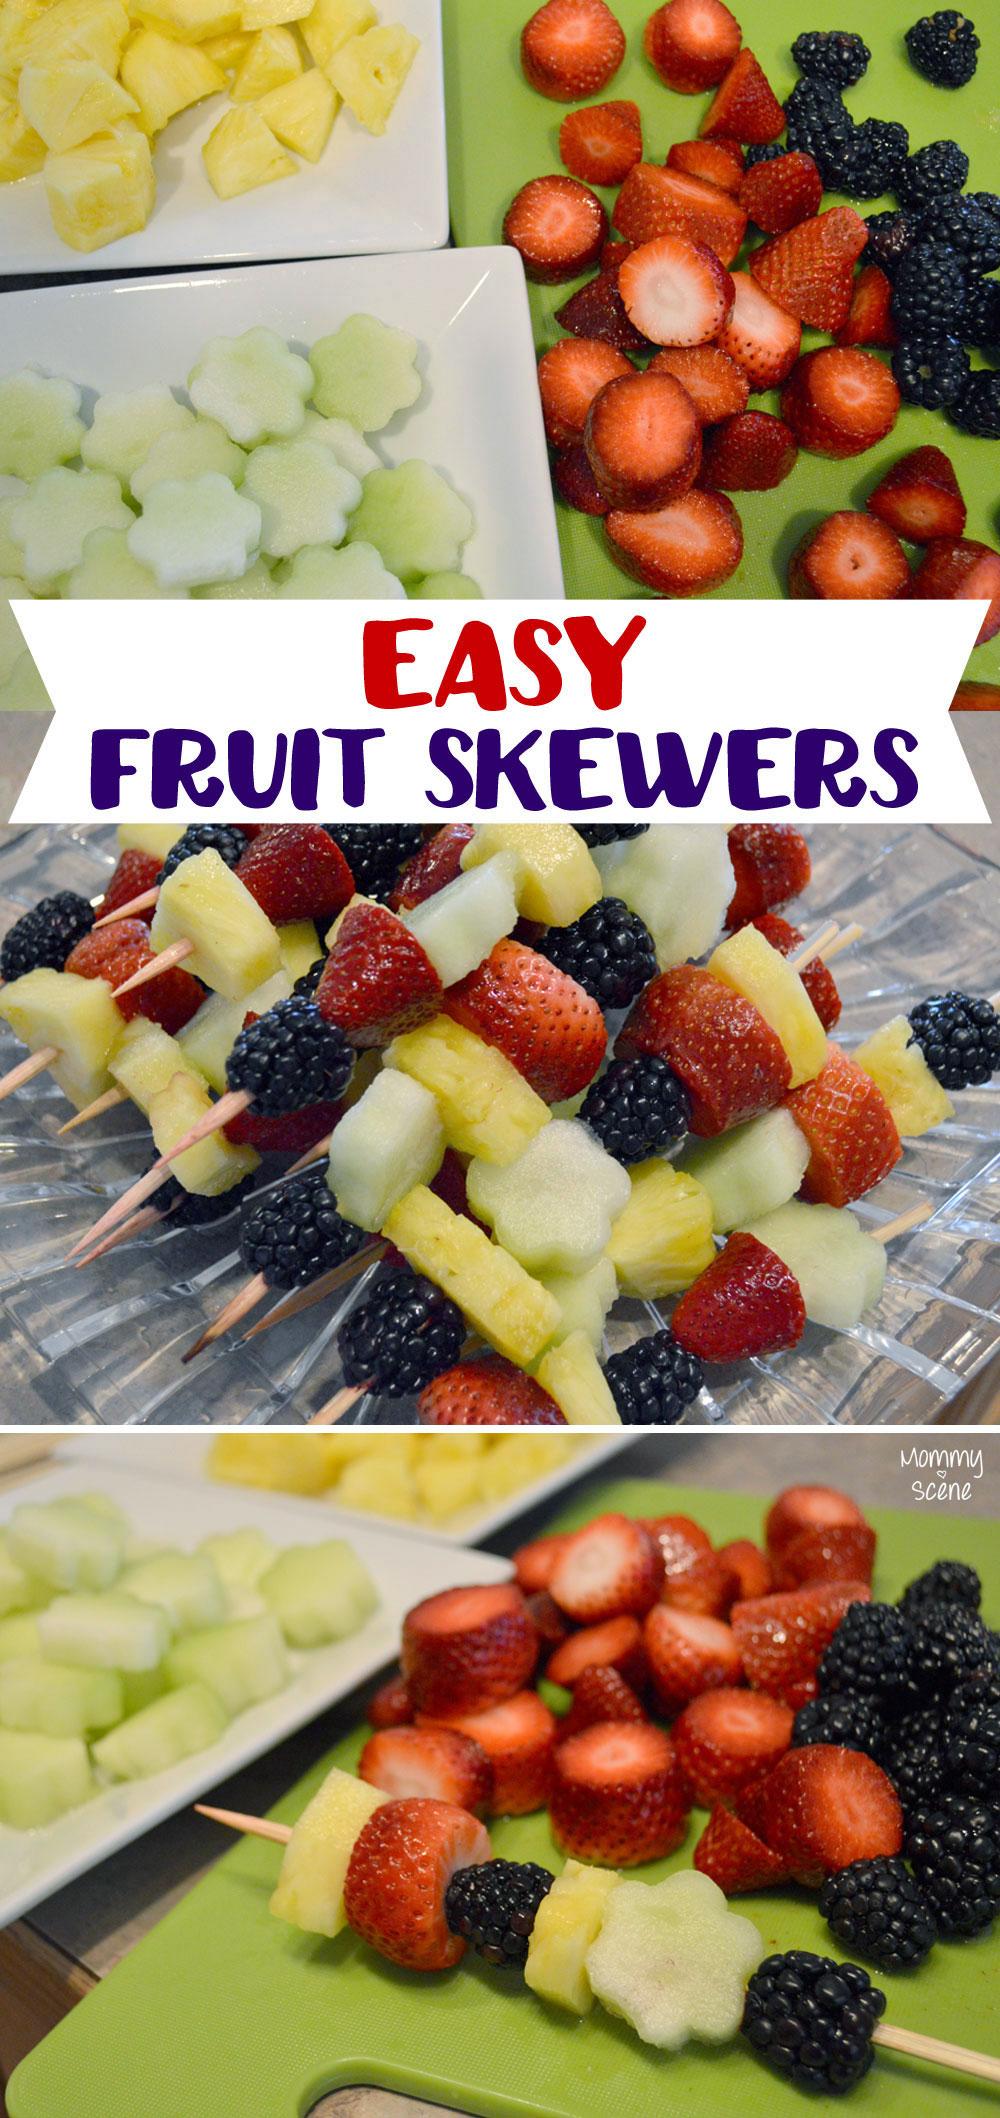 Easy Fruit Skewers for kids' parties - Mommy Scene